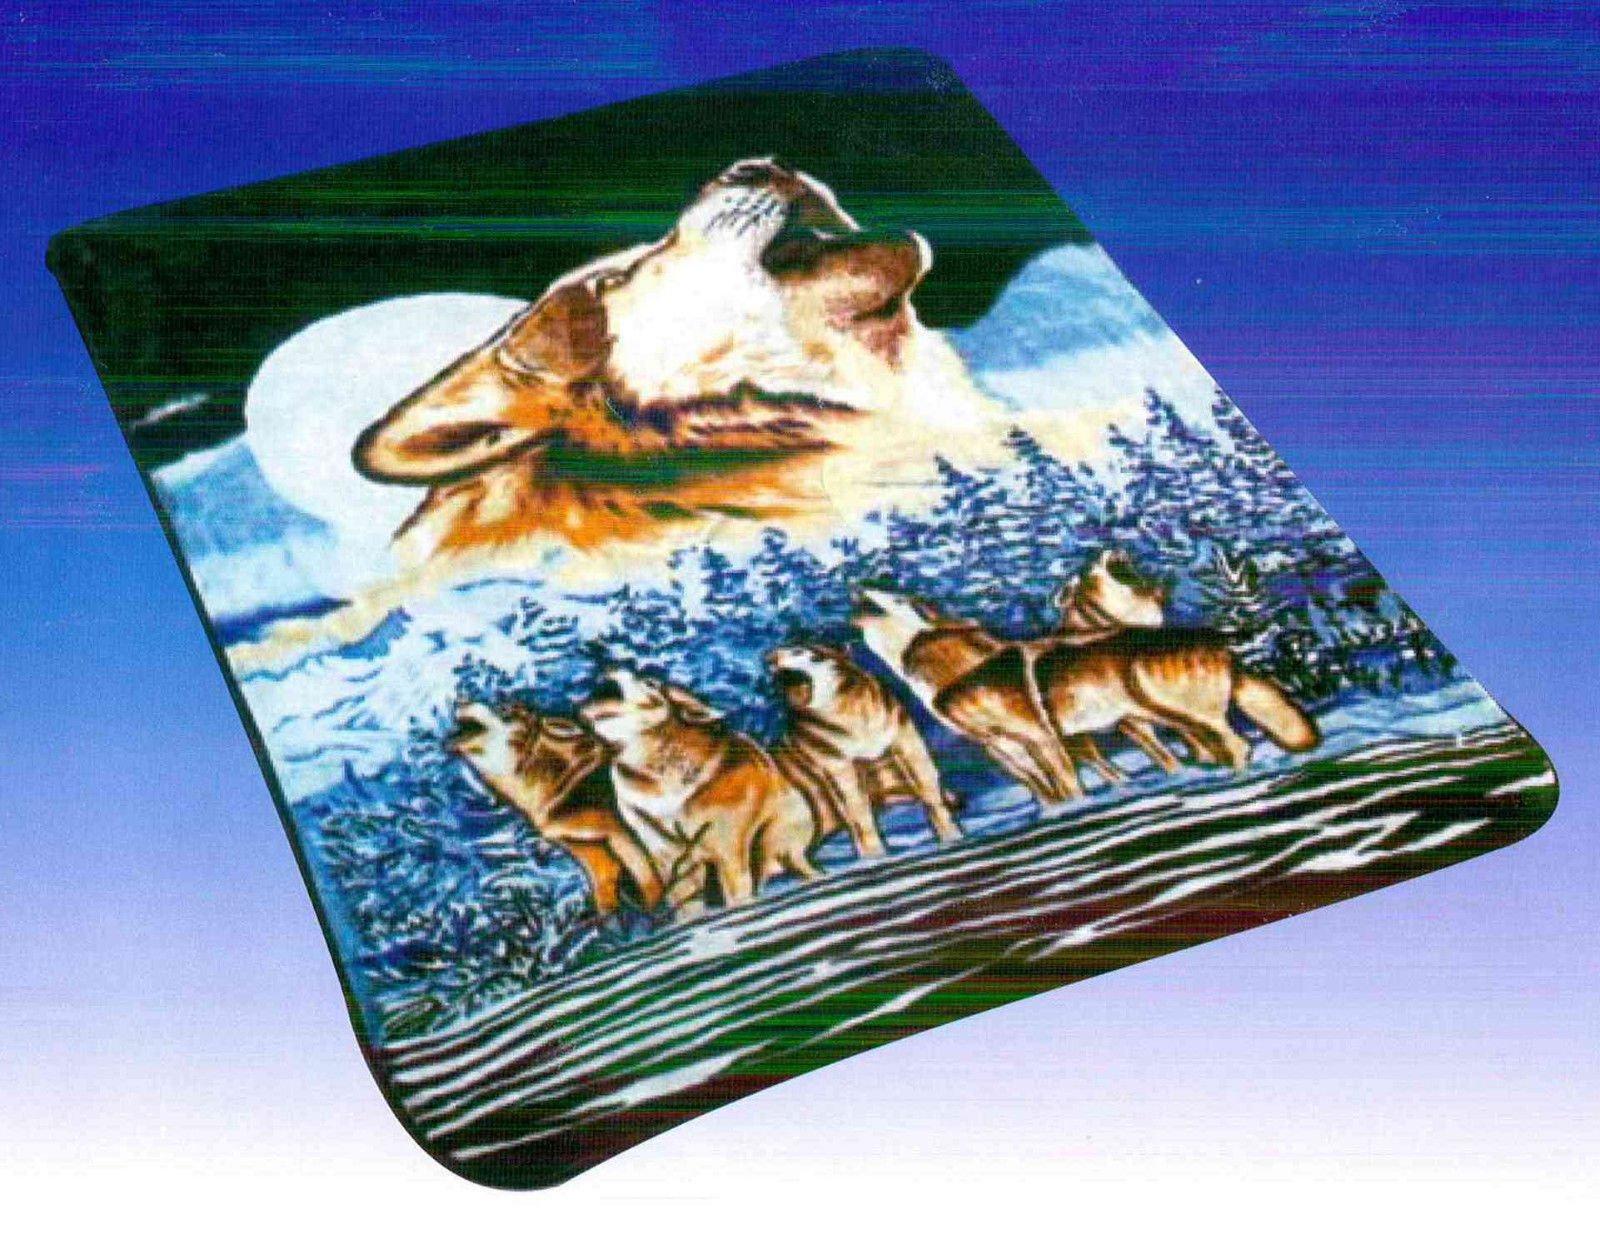 FAUX MINK FUR REVERSIBLE ANIMAL PRINT BLANKET, FULL OR QUEEN SIZE (Wolves)